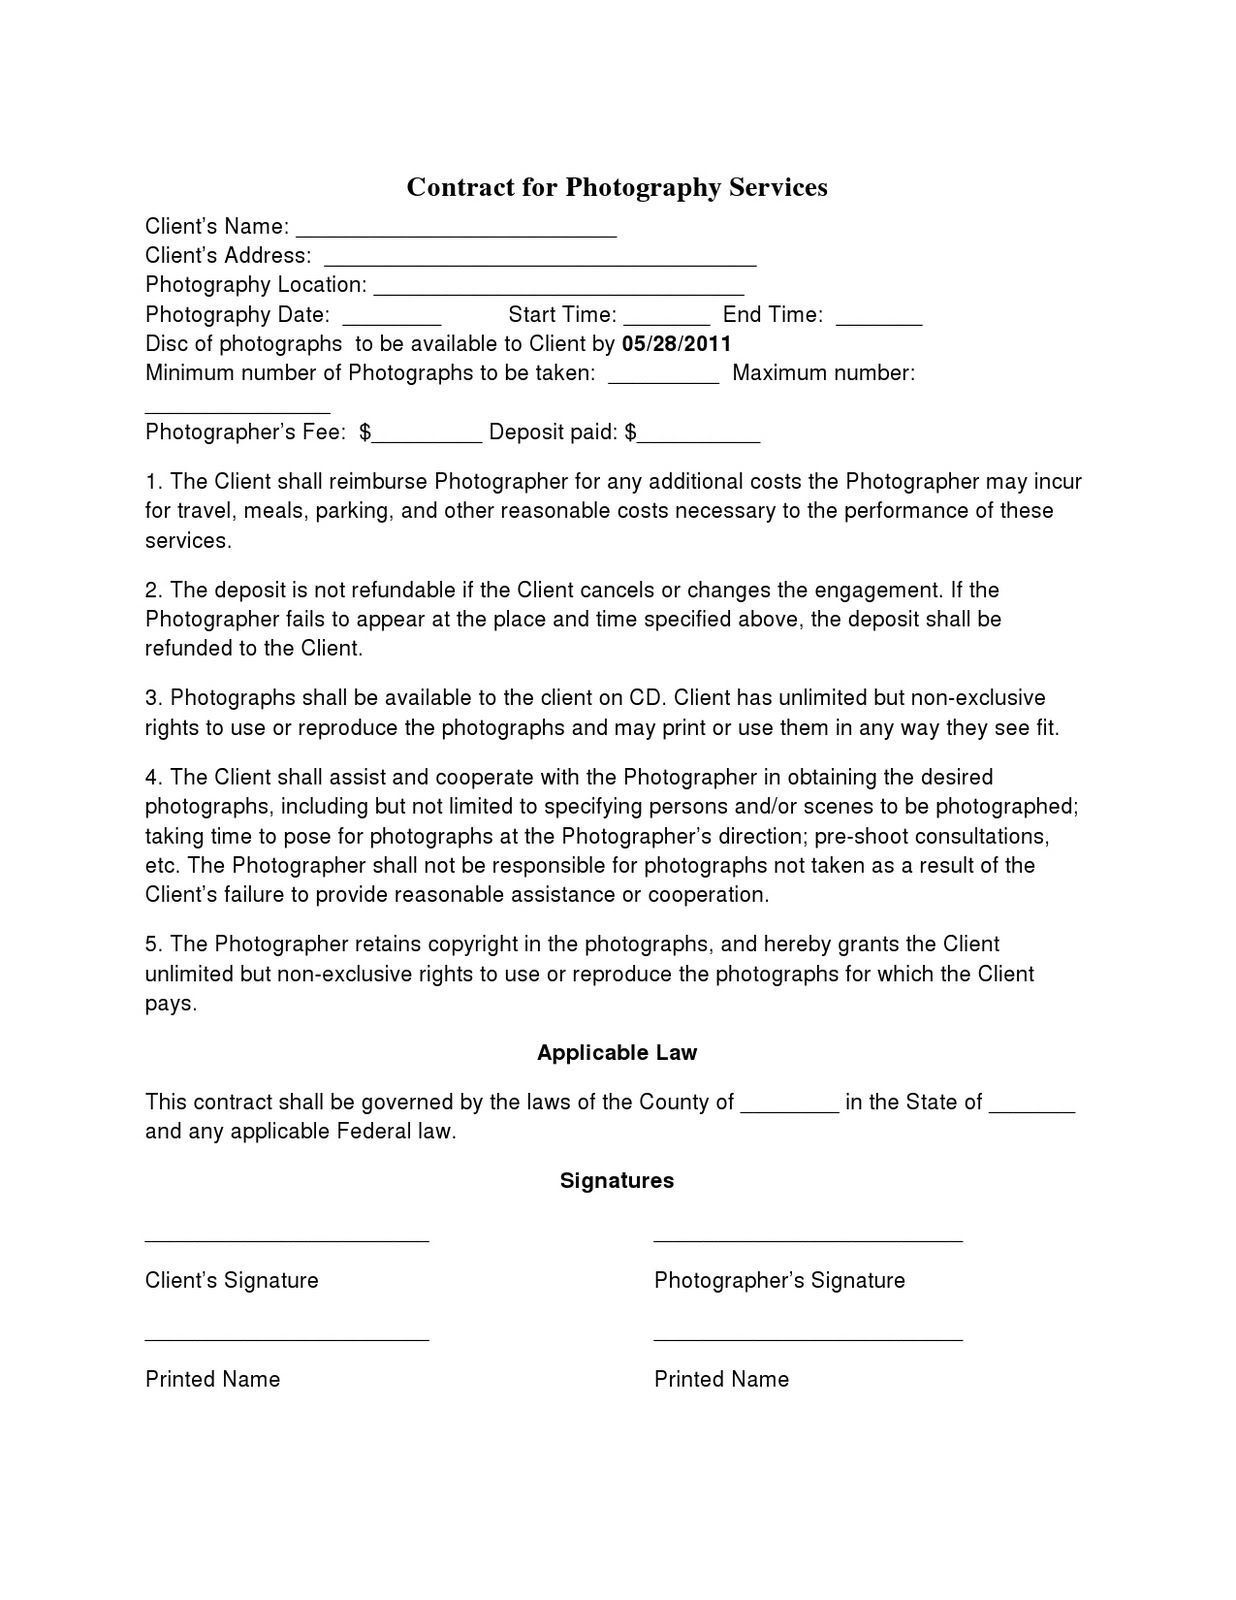 Wedding Photographer Contract Template